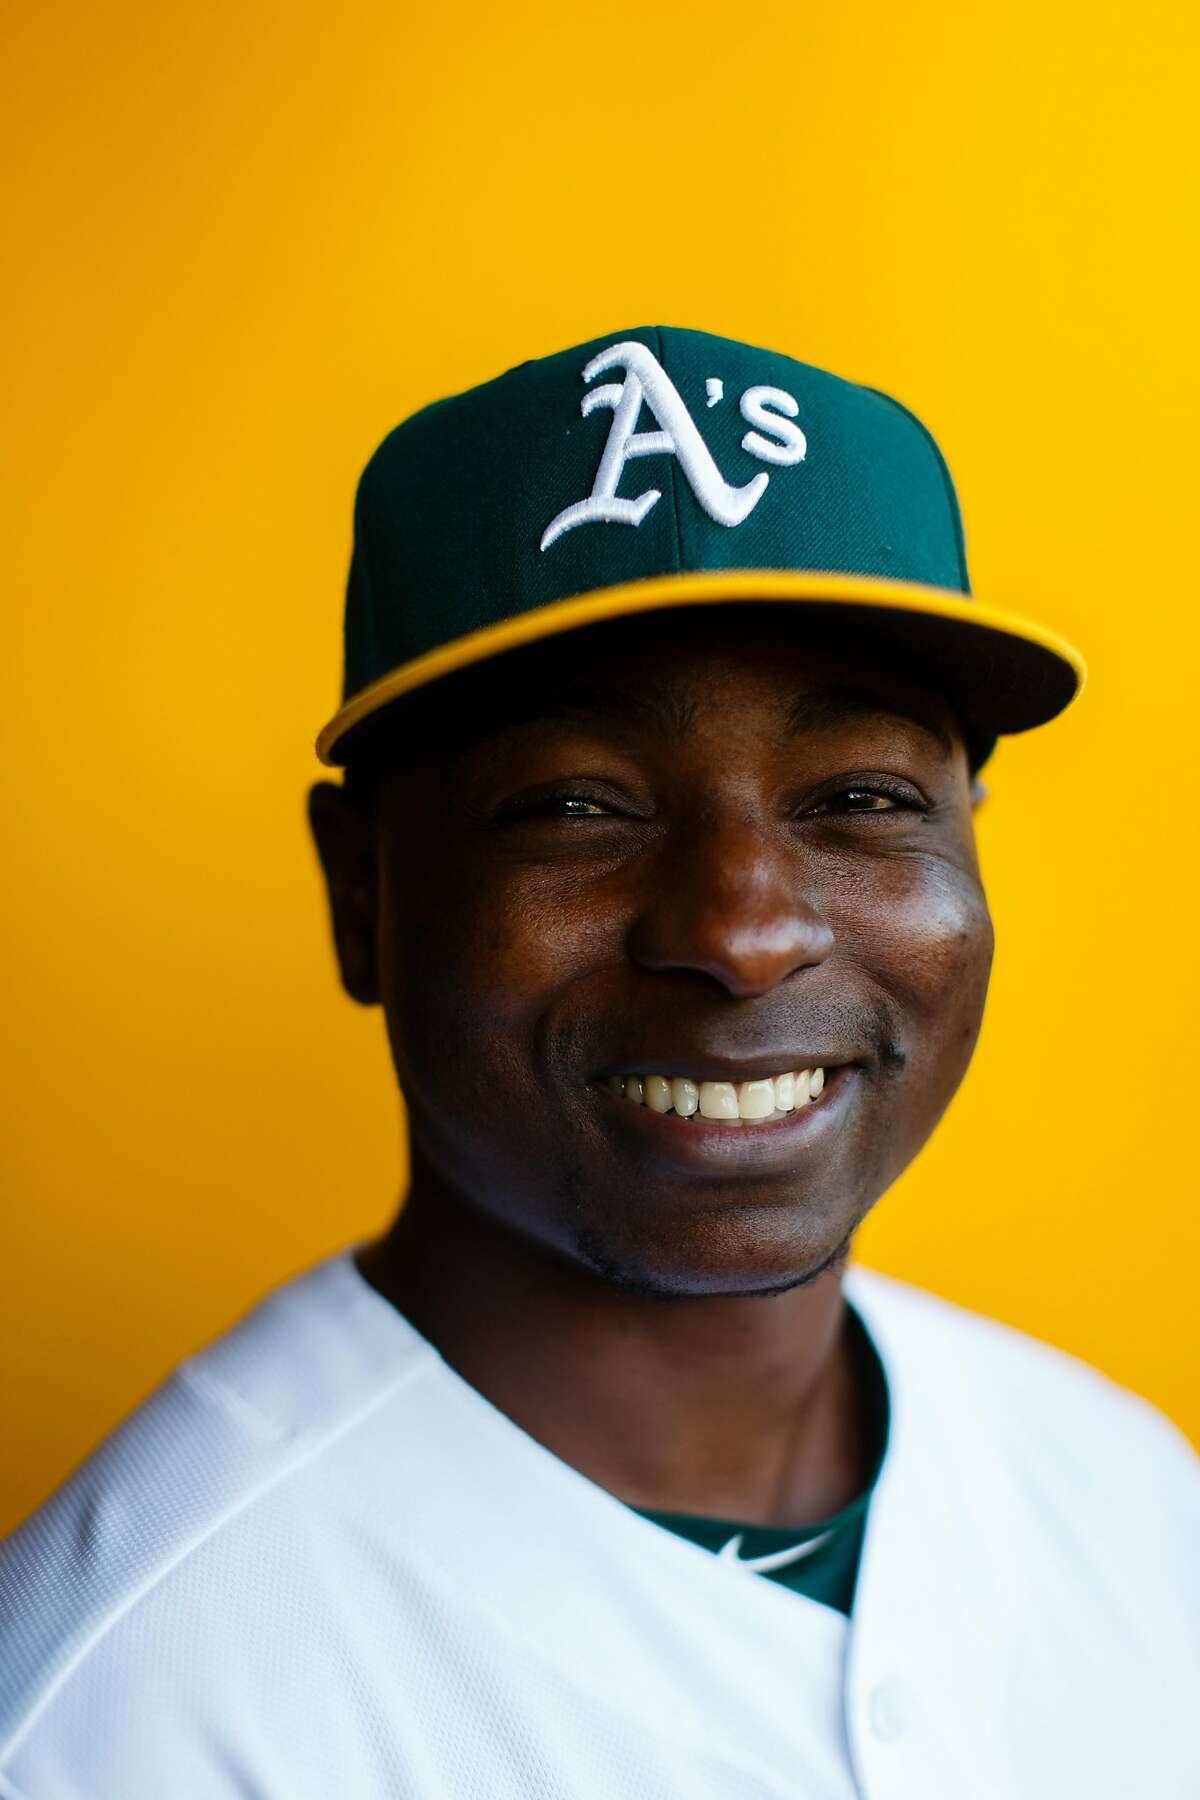 MESA, AZ - FEBRUARY 22: Jharel Cotton #45 of the Oakland Athletics poses for a portrait during photo day at HoHoKam Stadium on February 22, 2018 in Mesa, Arizona. ~~